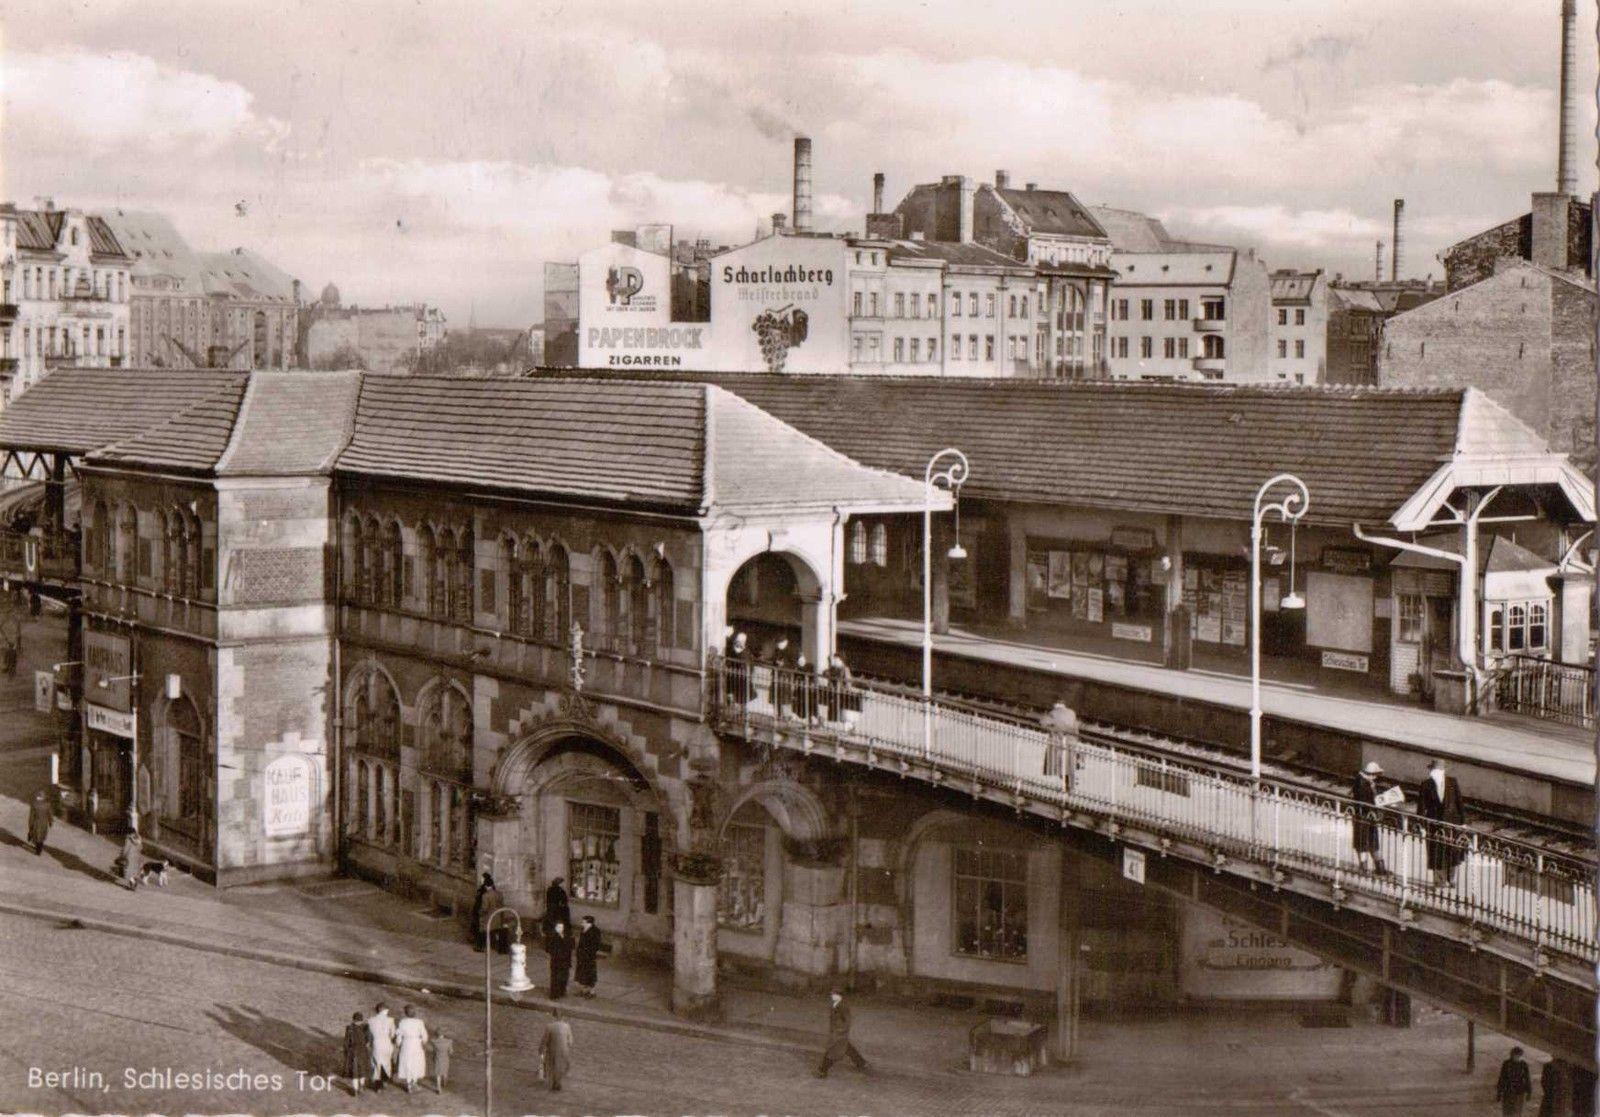 Ak Berlin alte foto ak berlin schlesisches tor reklame bahnhof eur 10 00